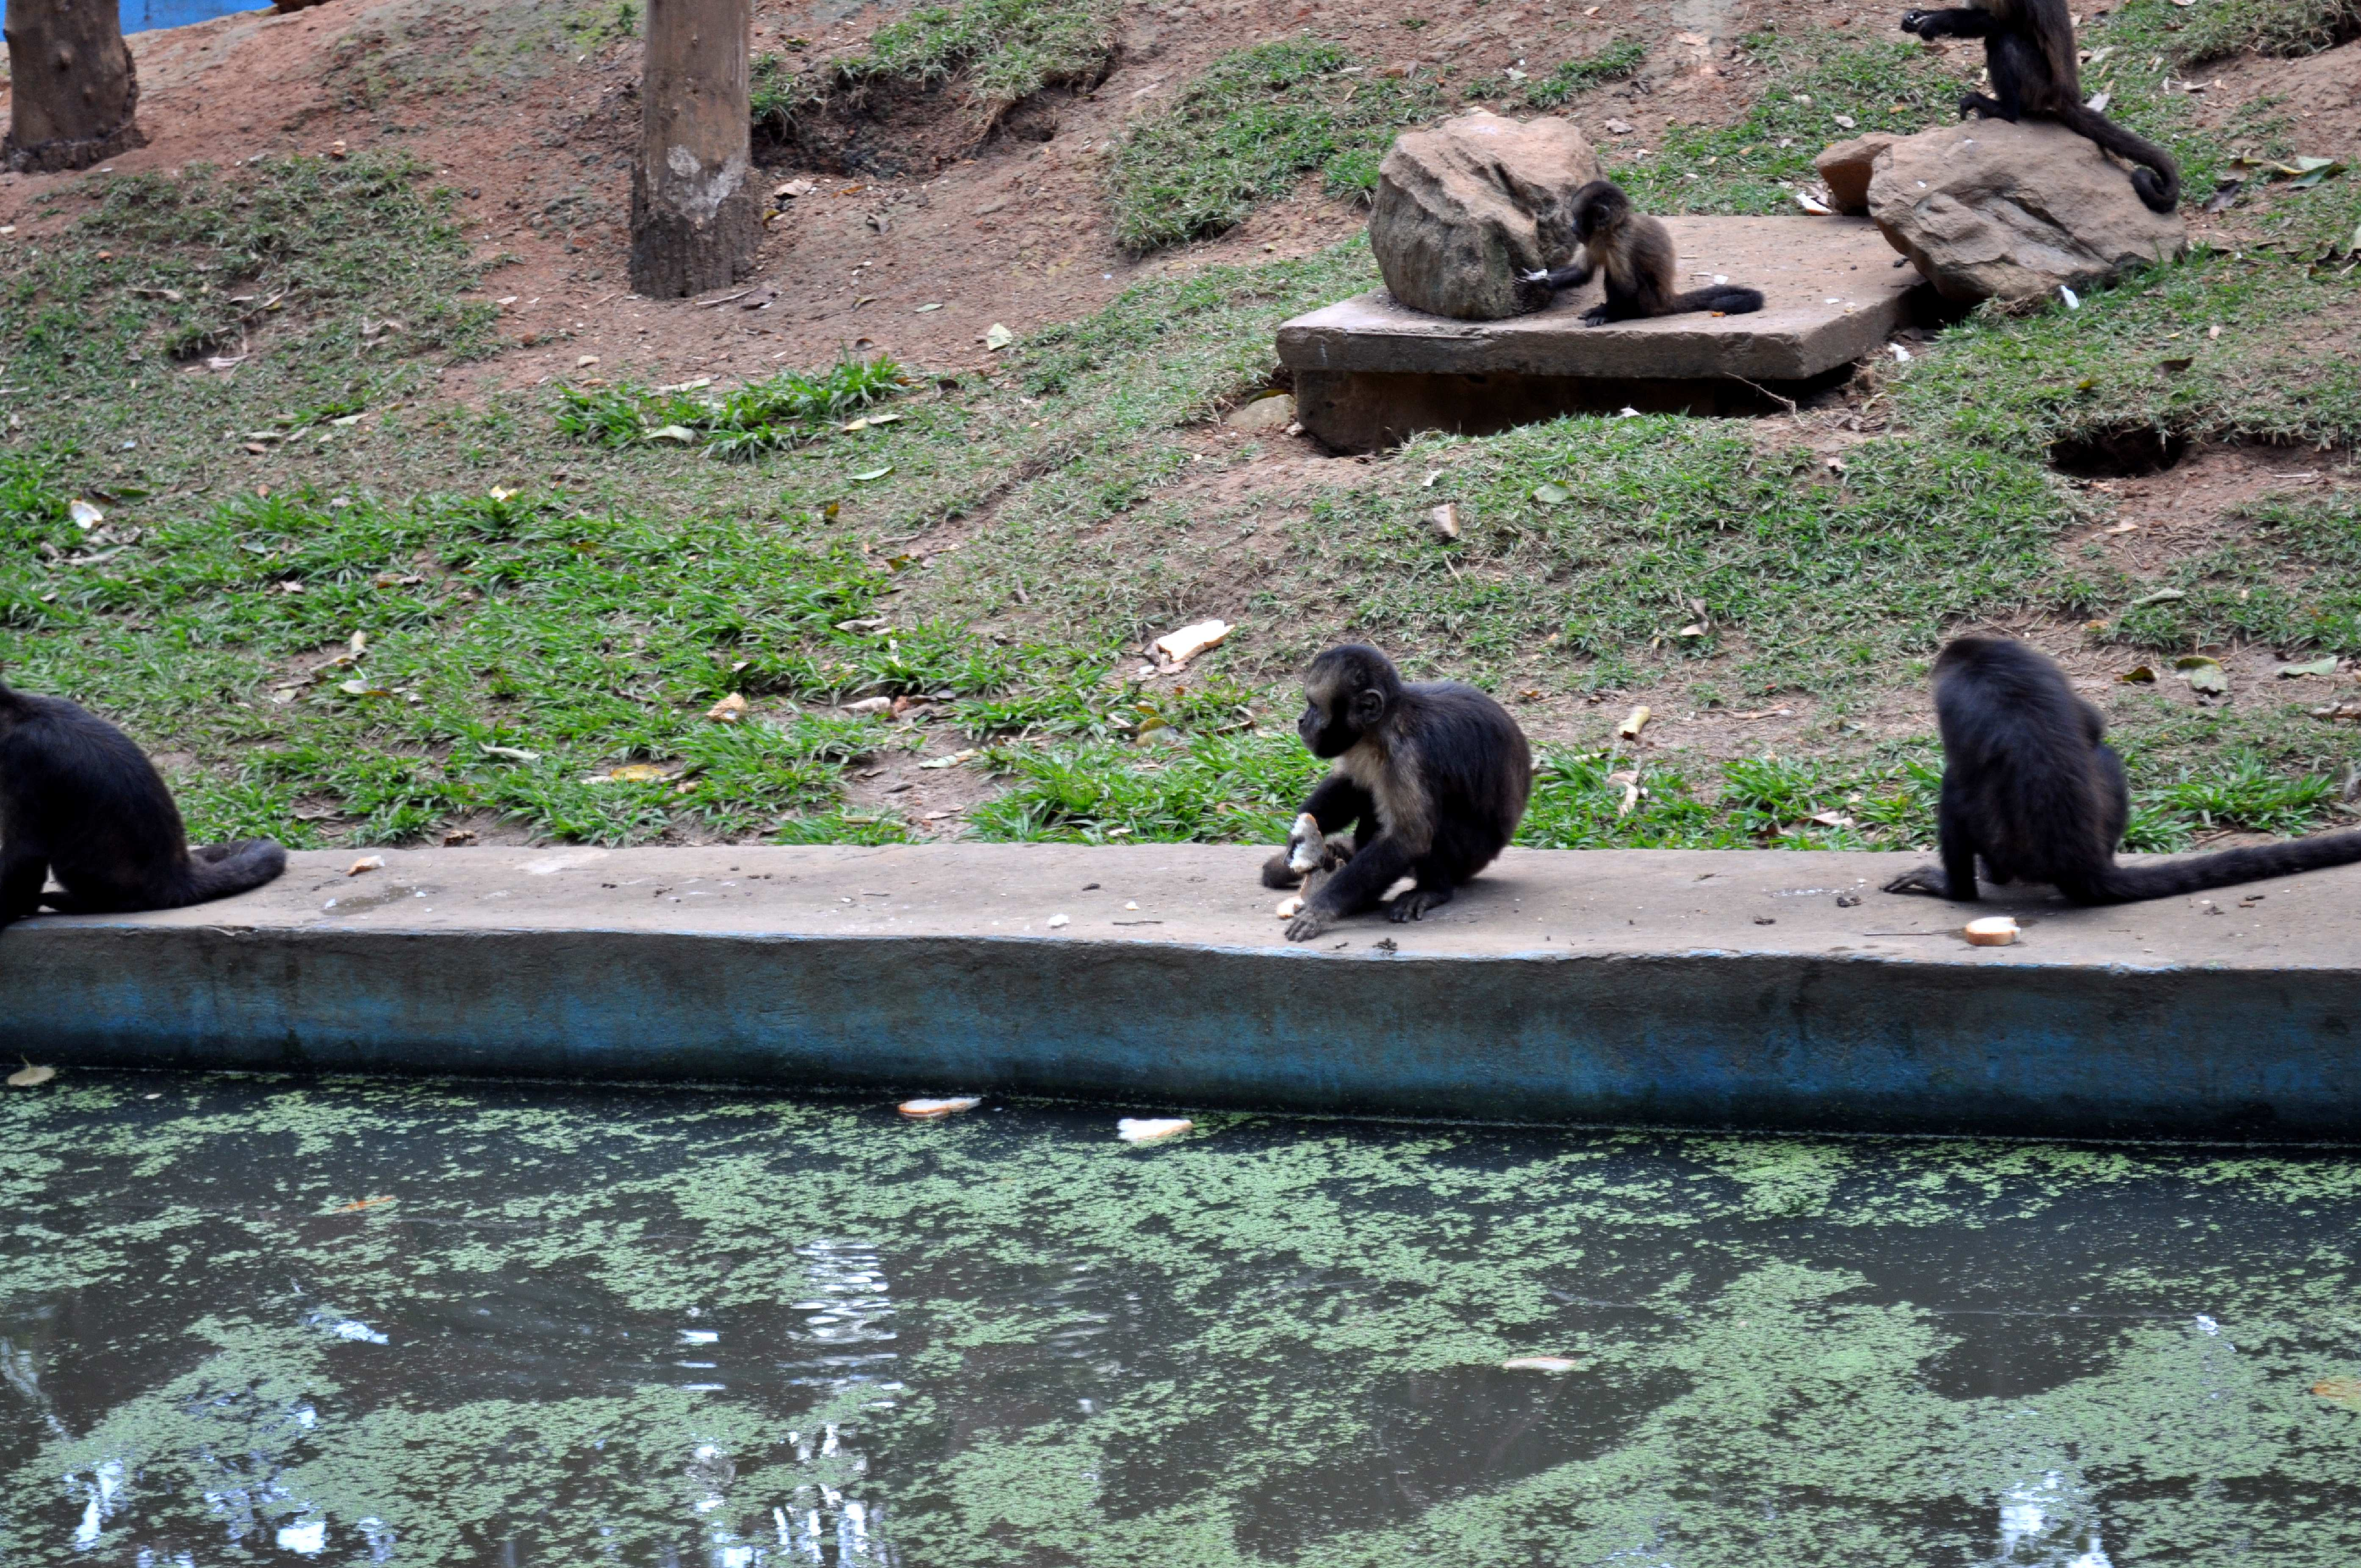 Free photograph; monkeys, banks, pool, zoo